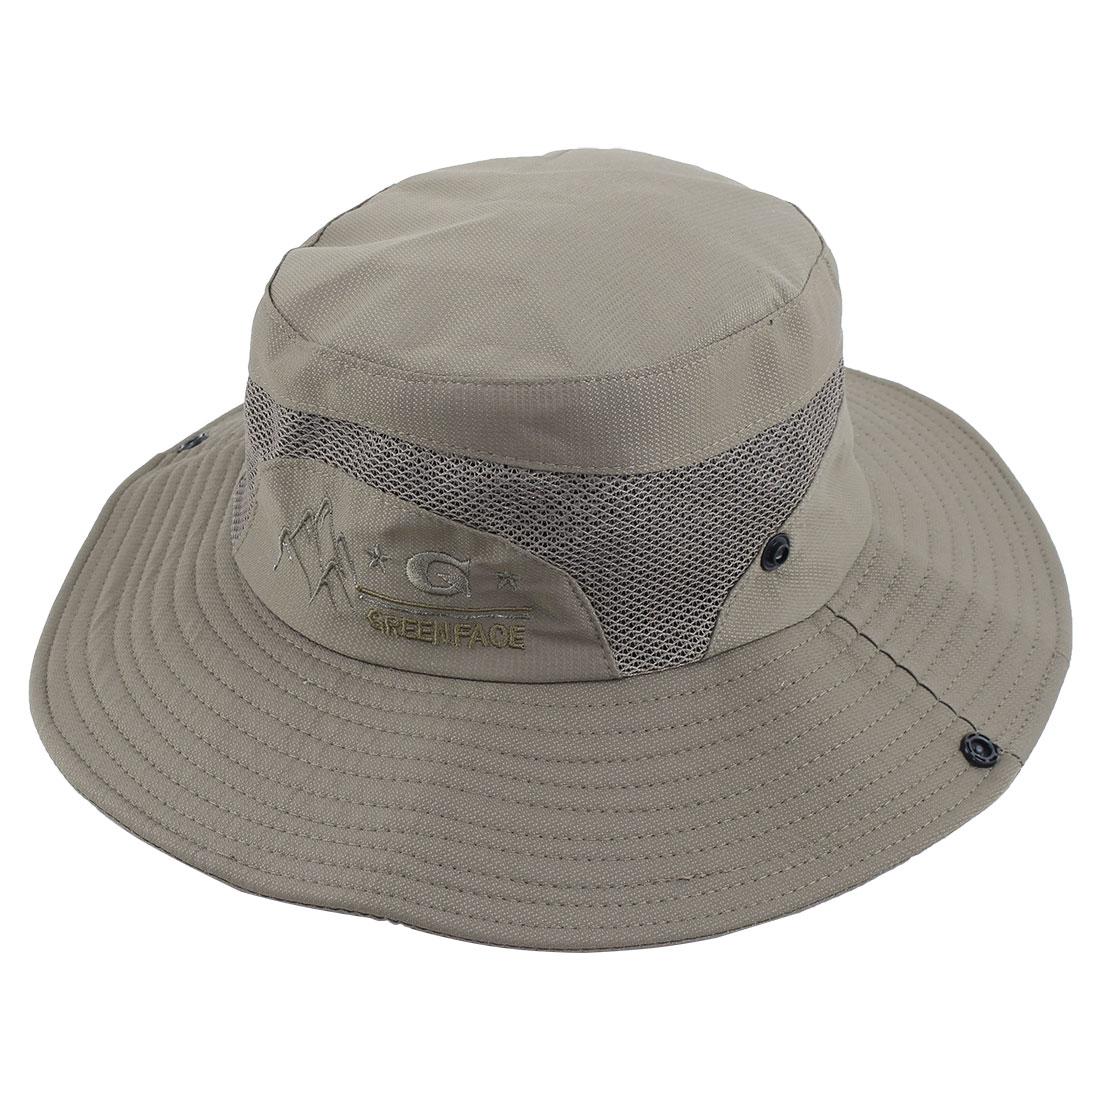 Fisherman Outdoor Fishing Climbing Cycling Adjustable Mesh Brim Floppy Summer Beach Cap Bucket Sun Hat Olive Green